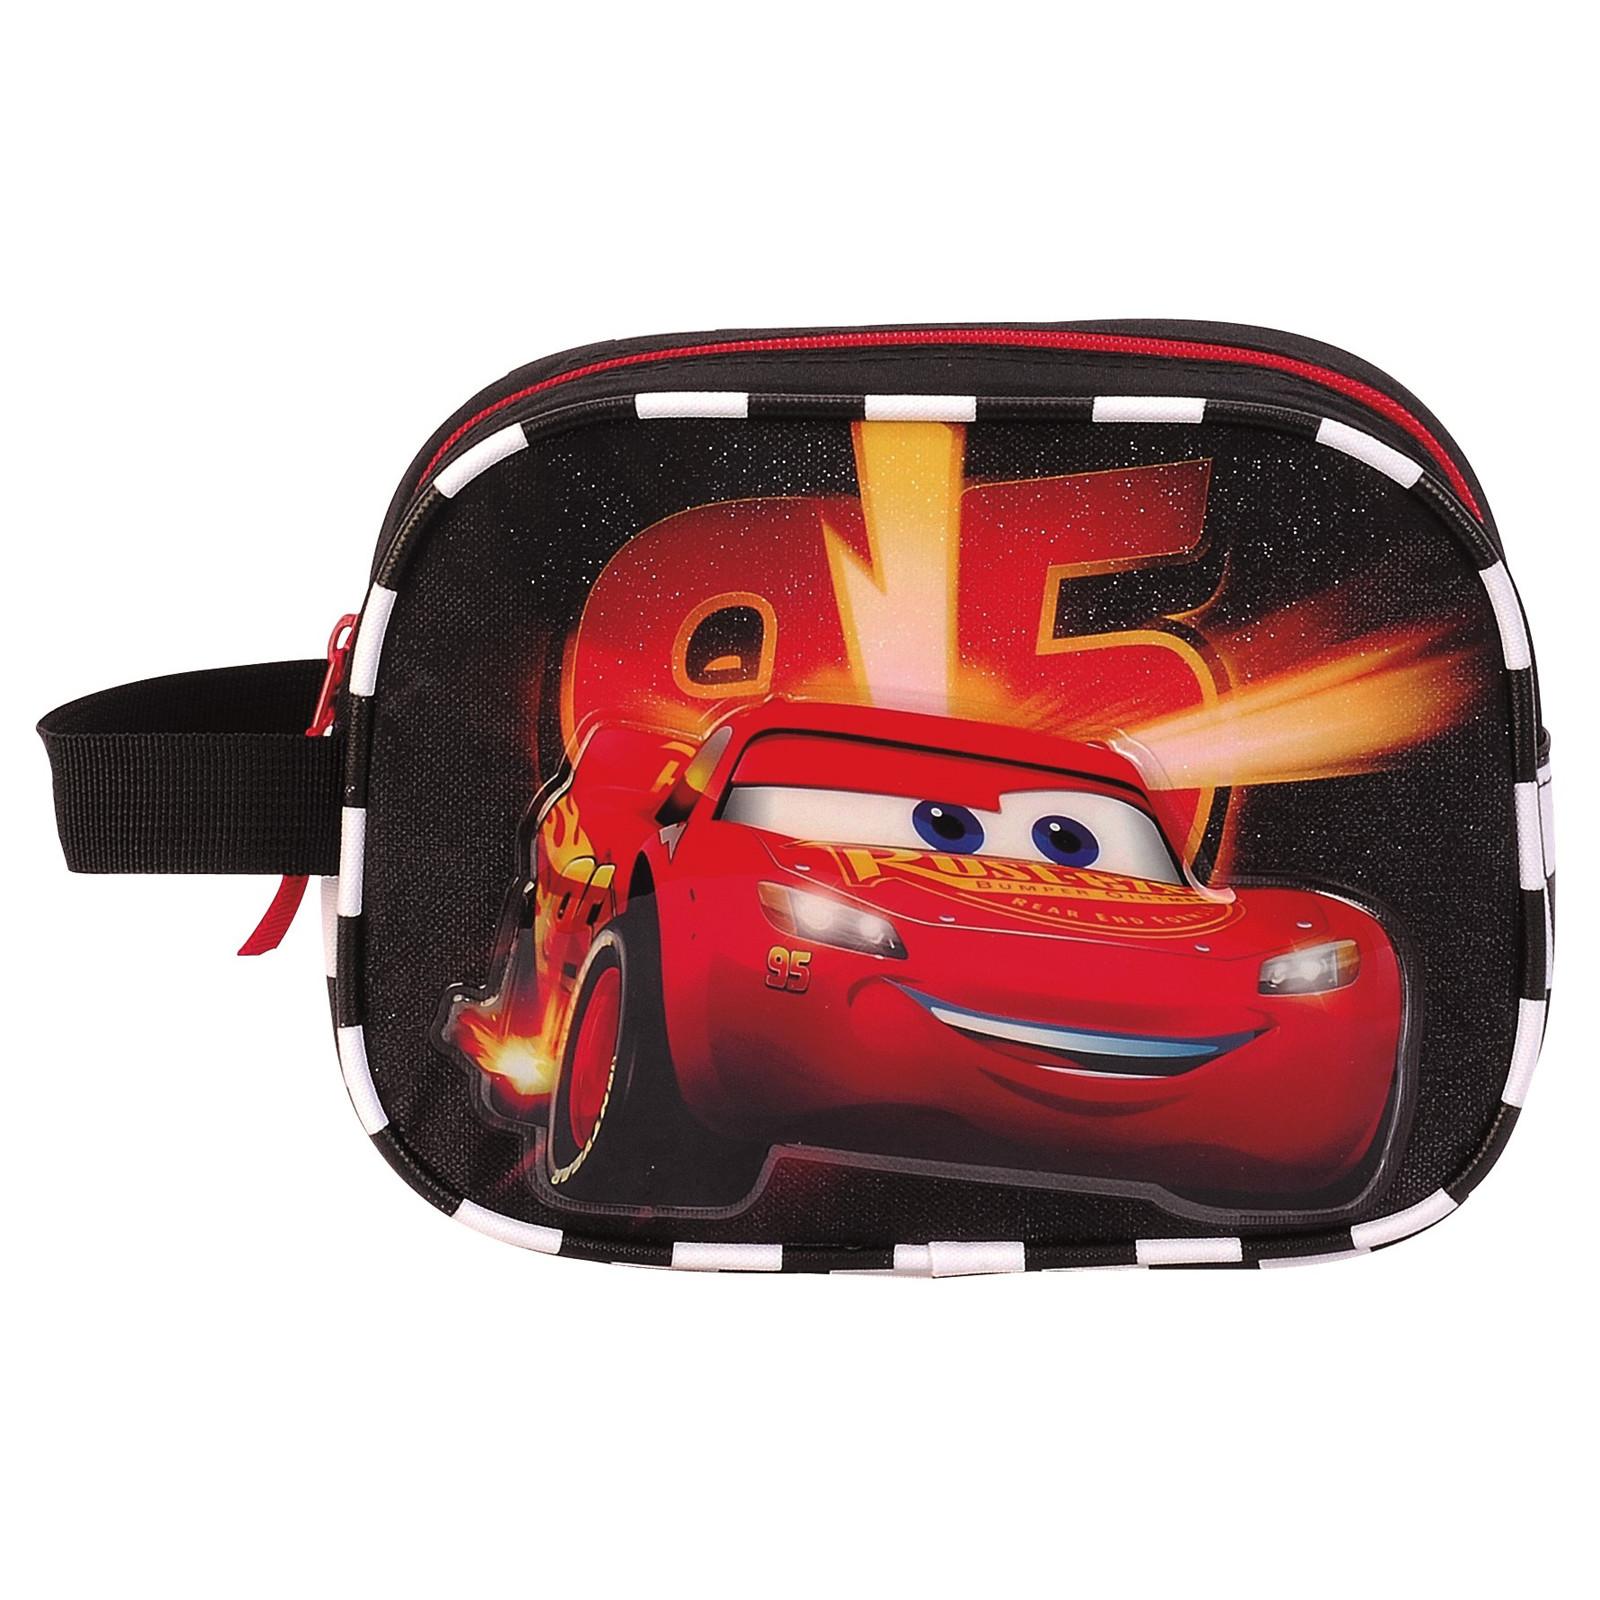 Disney Cars toilettaske med lynlås